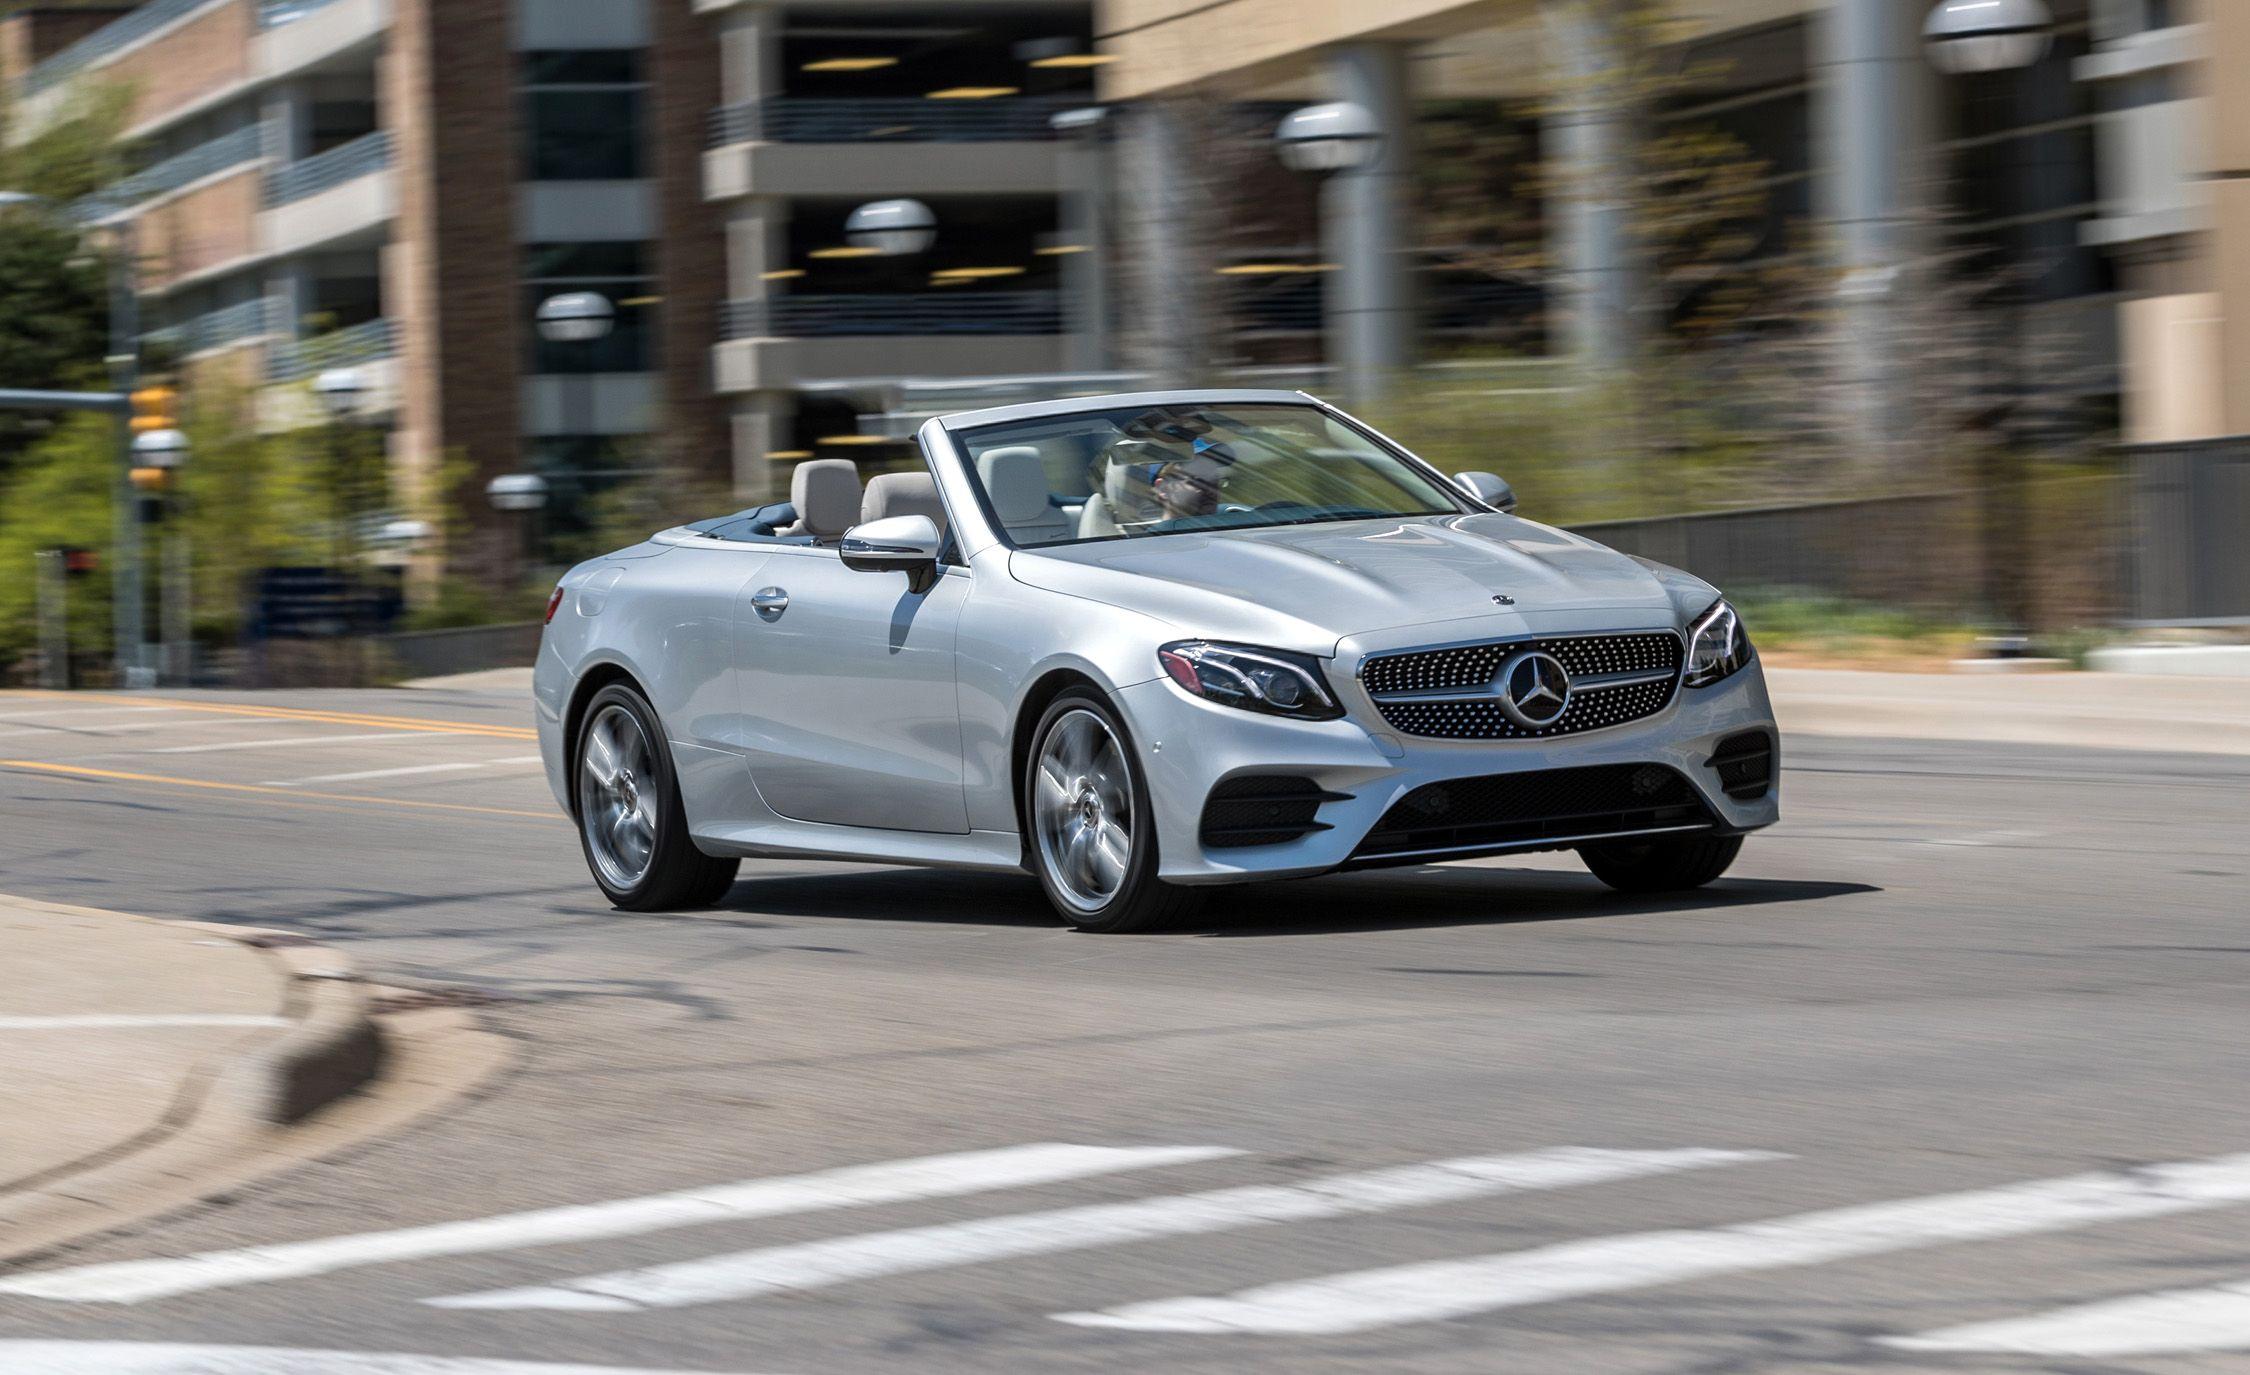 Mercedes-Benz E-class Reviews | Mercedes-Benz E-class Price, Photos, and  Specs | Car and Driver